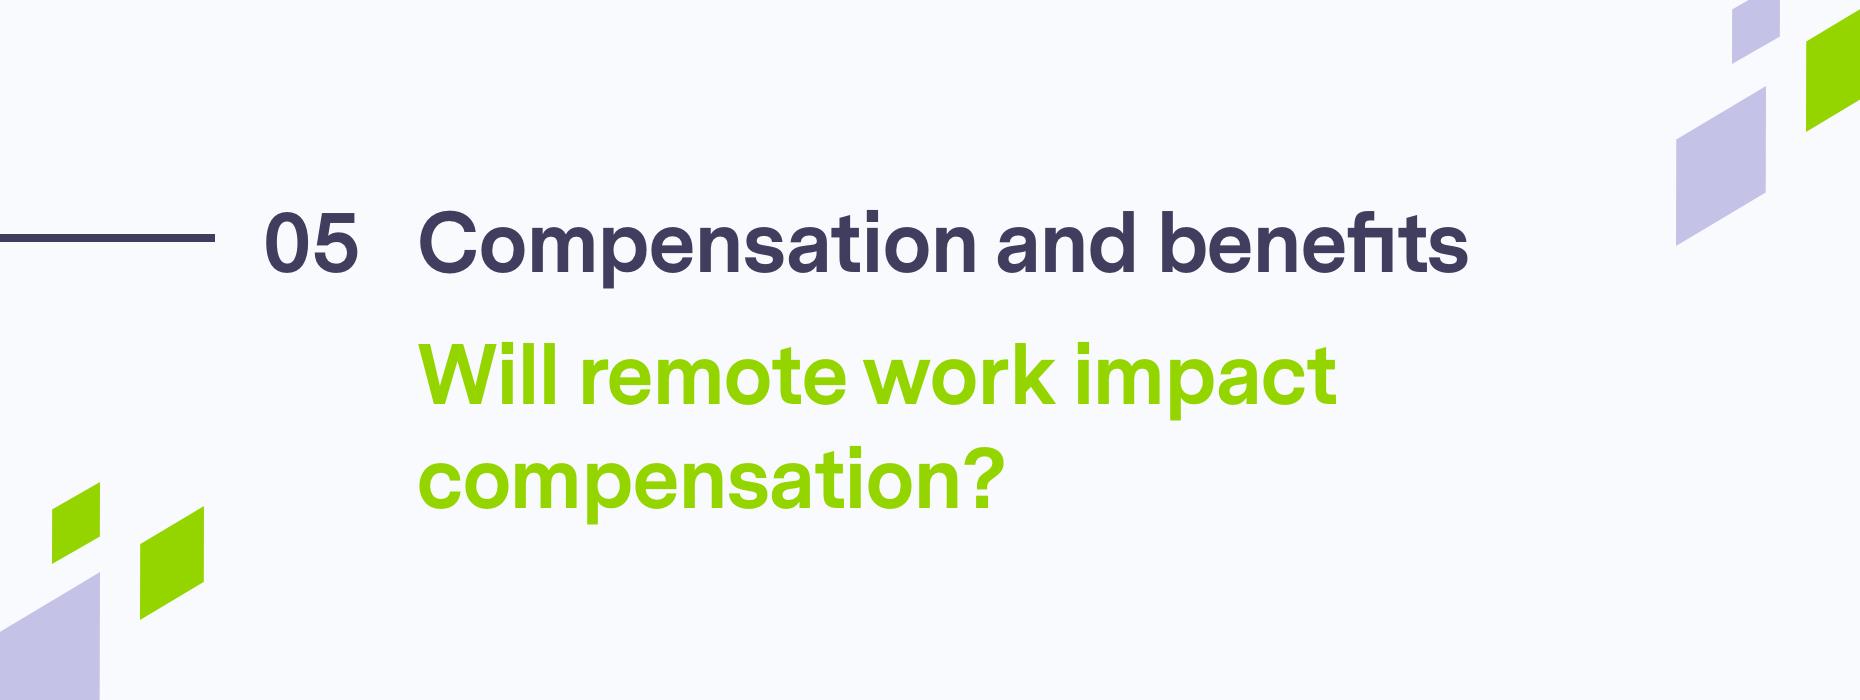 Will remote work impact compensation?